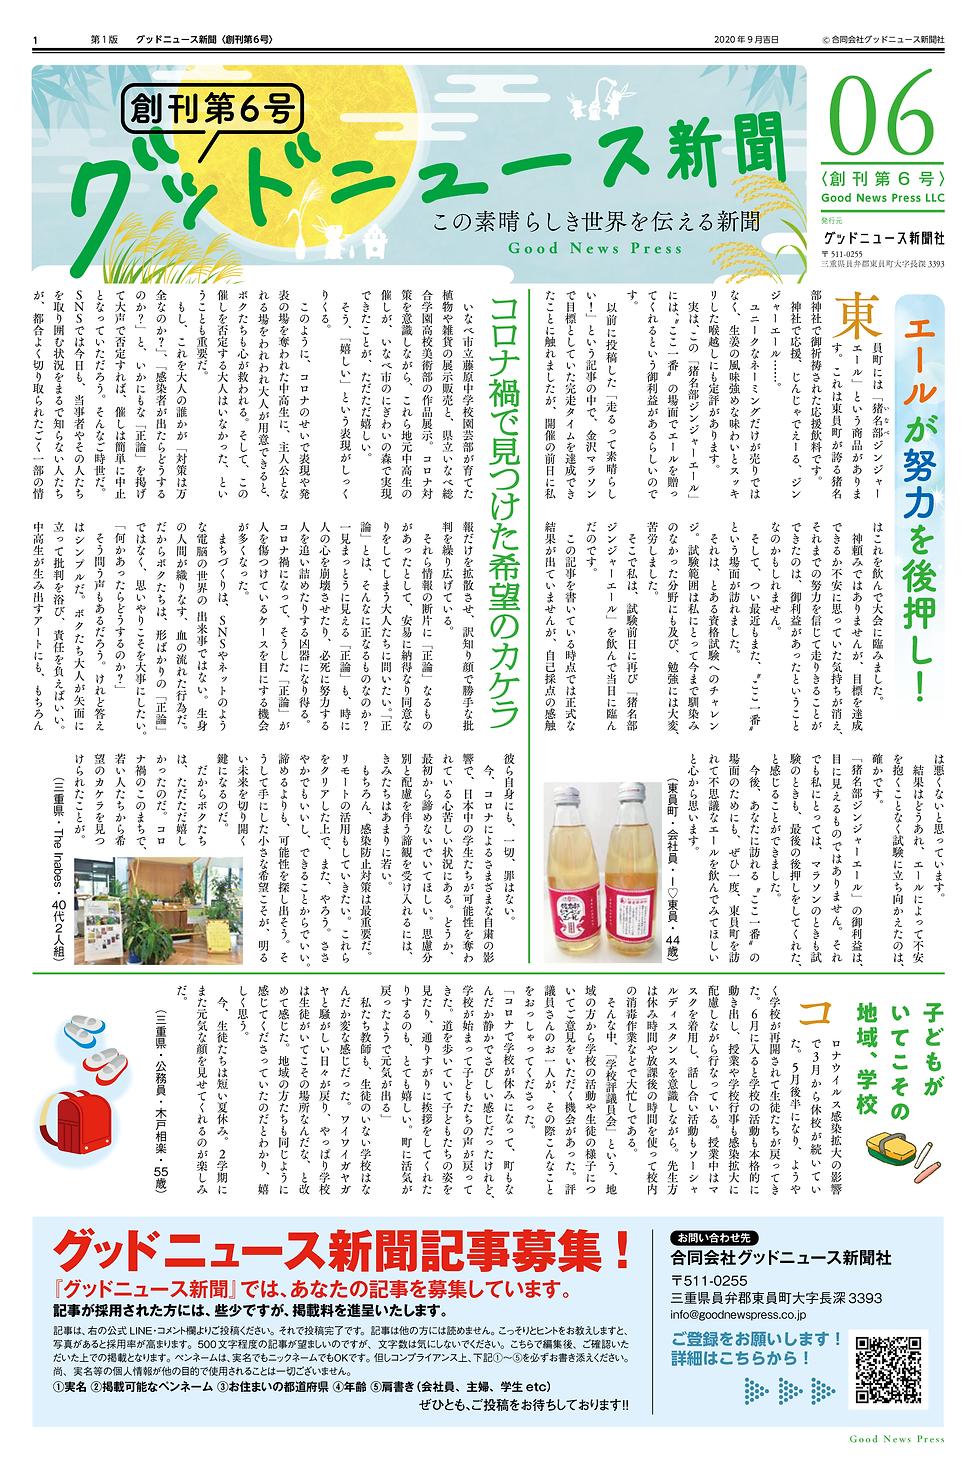 GNP6go-webyo_ページ_1.png